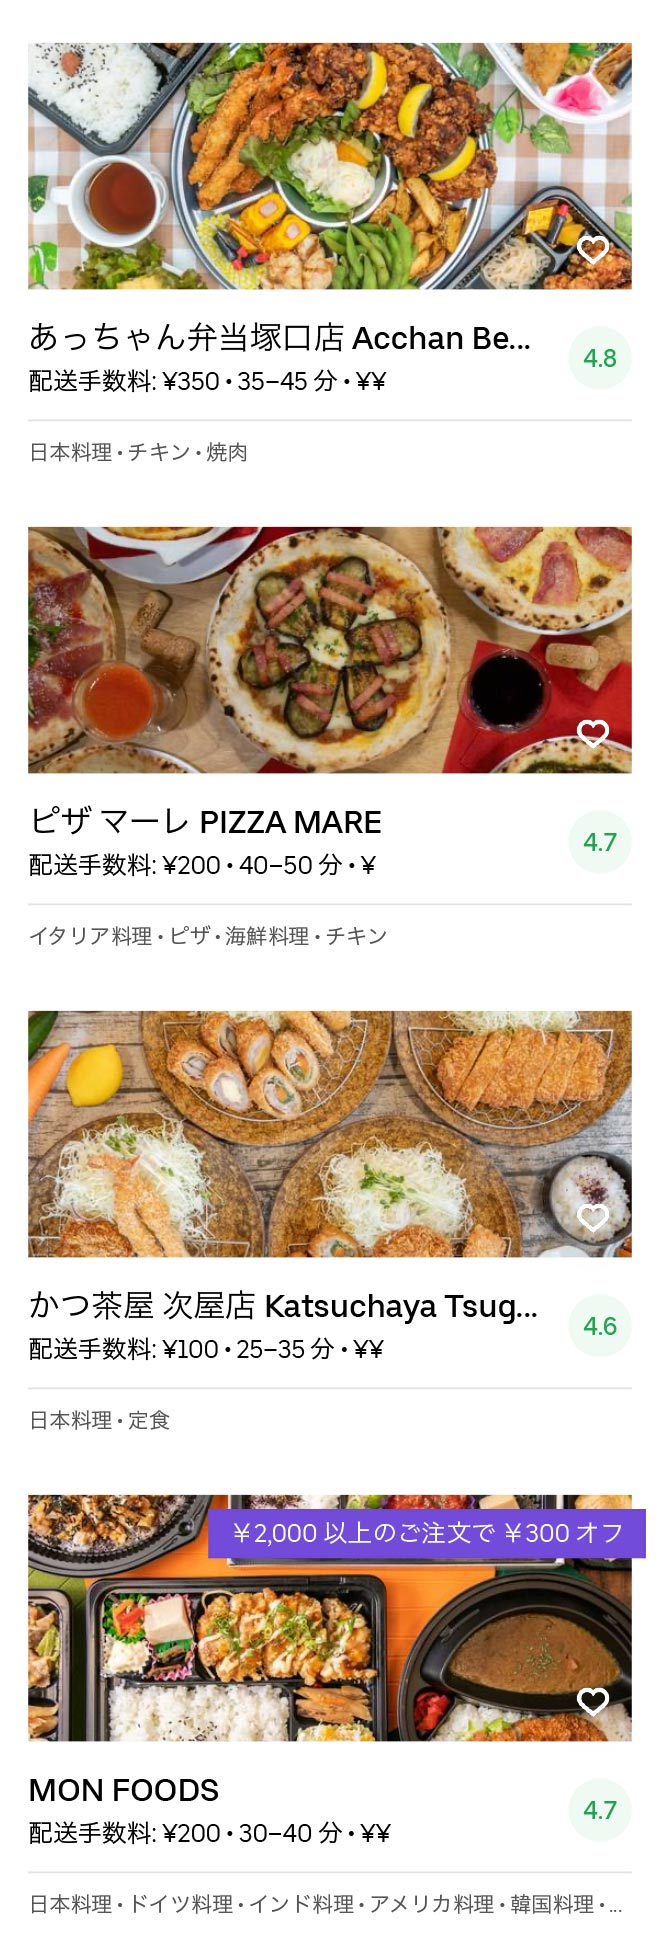 Amagasaki menu 2005 06